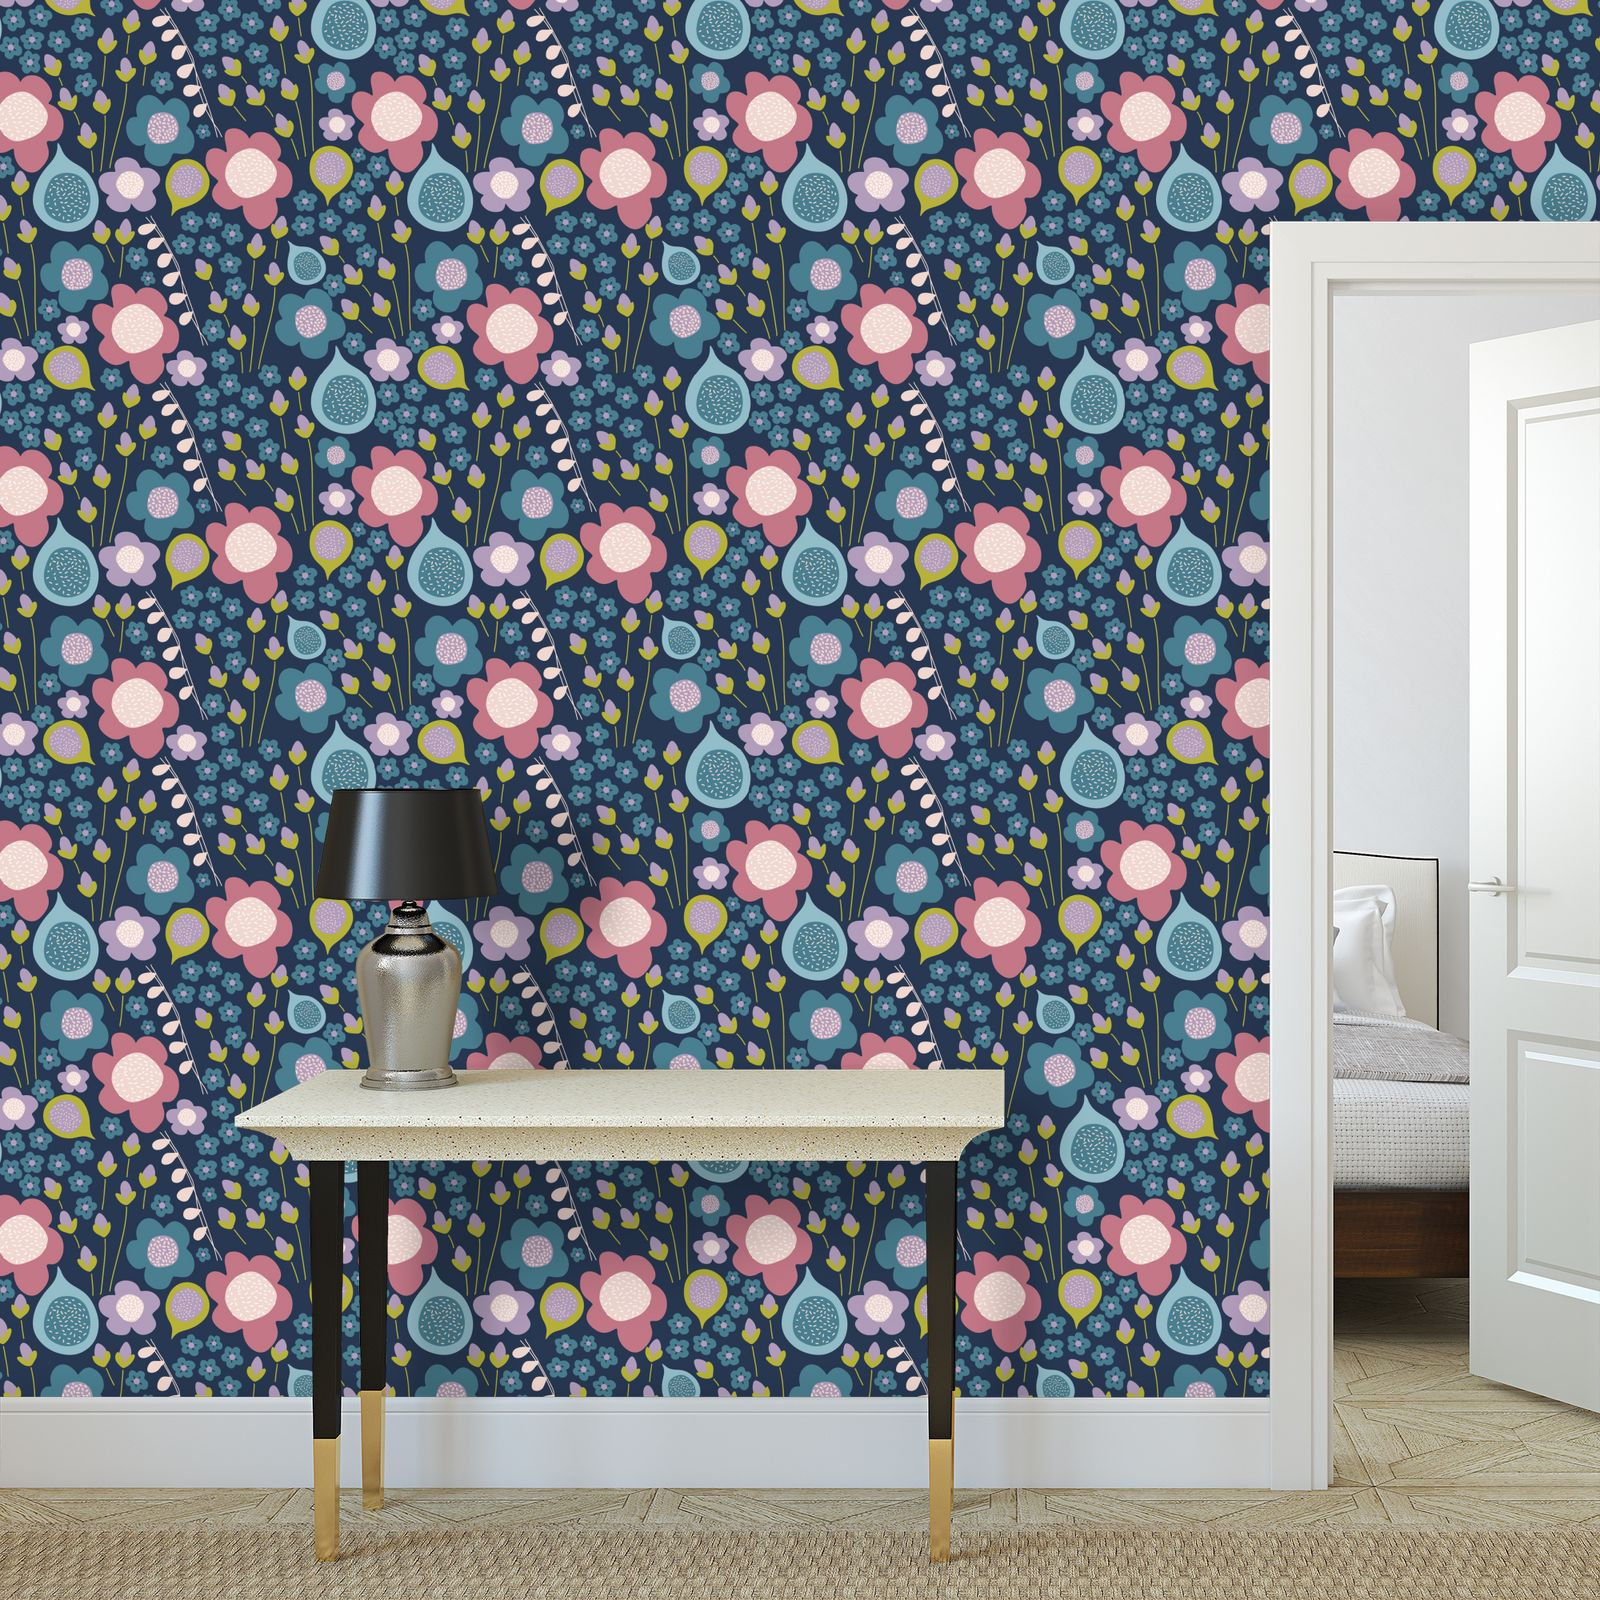 Floral 01 Wallpaper